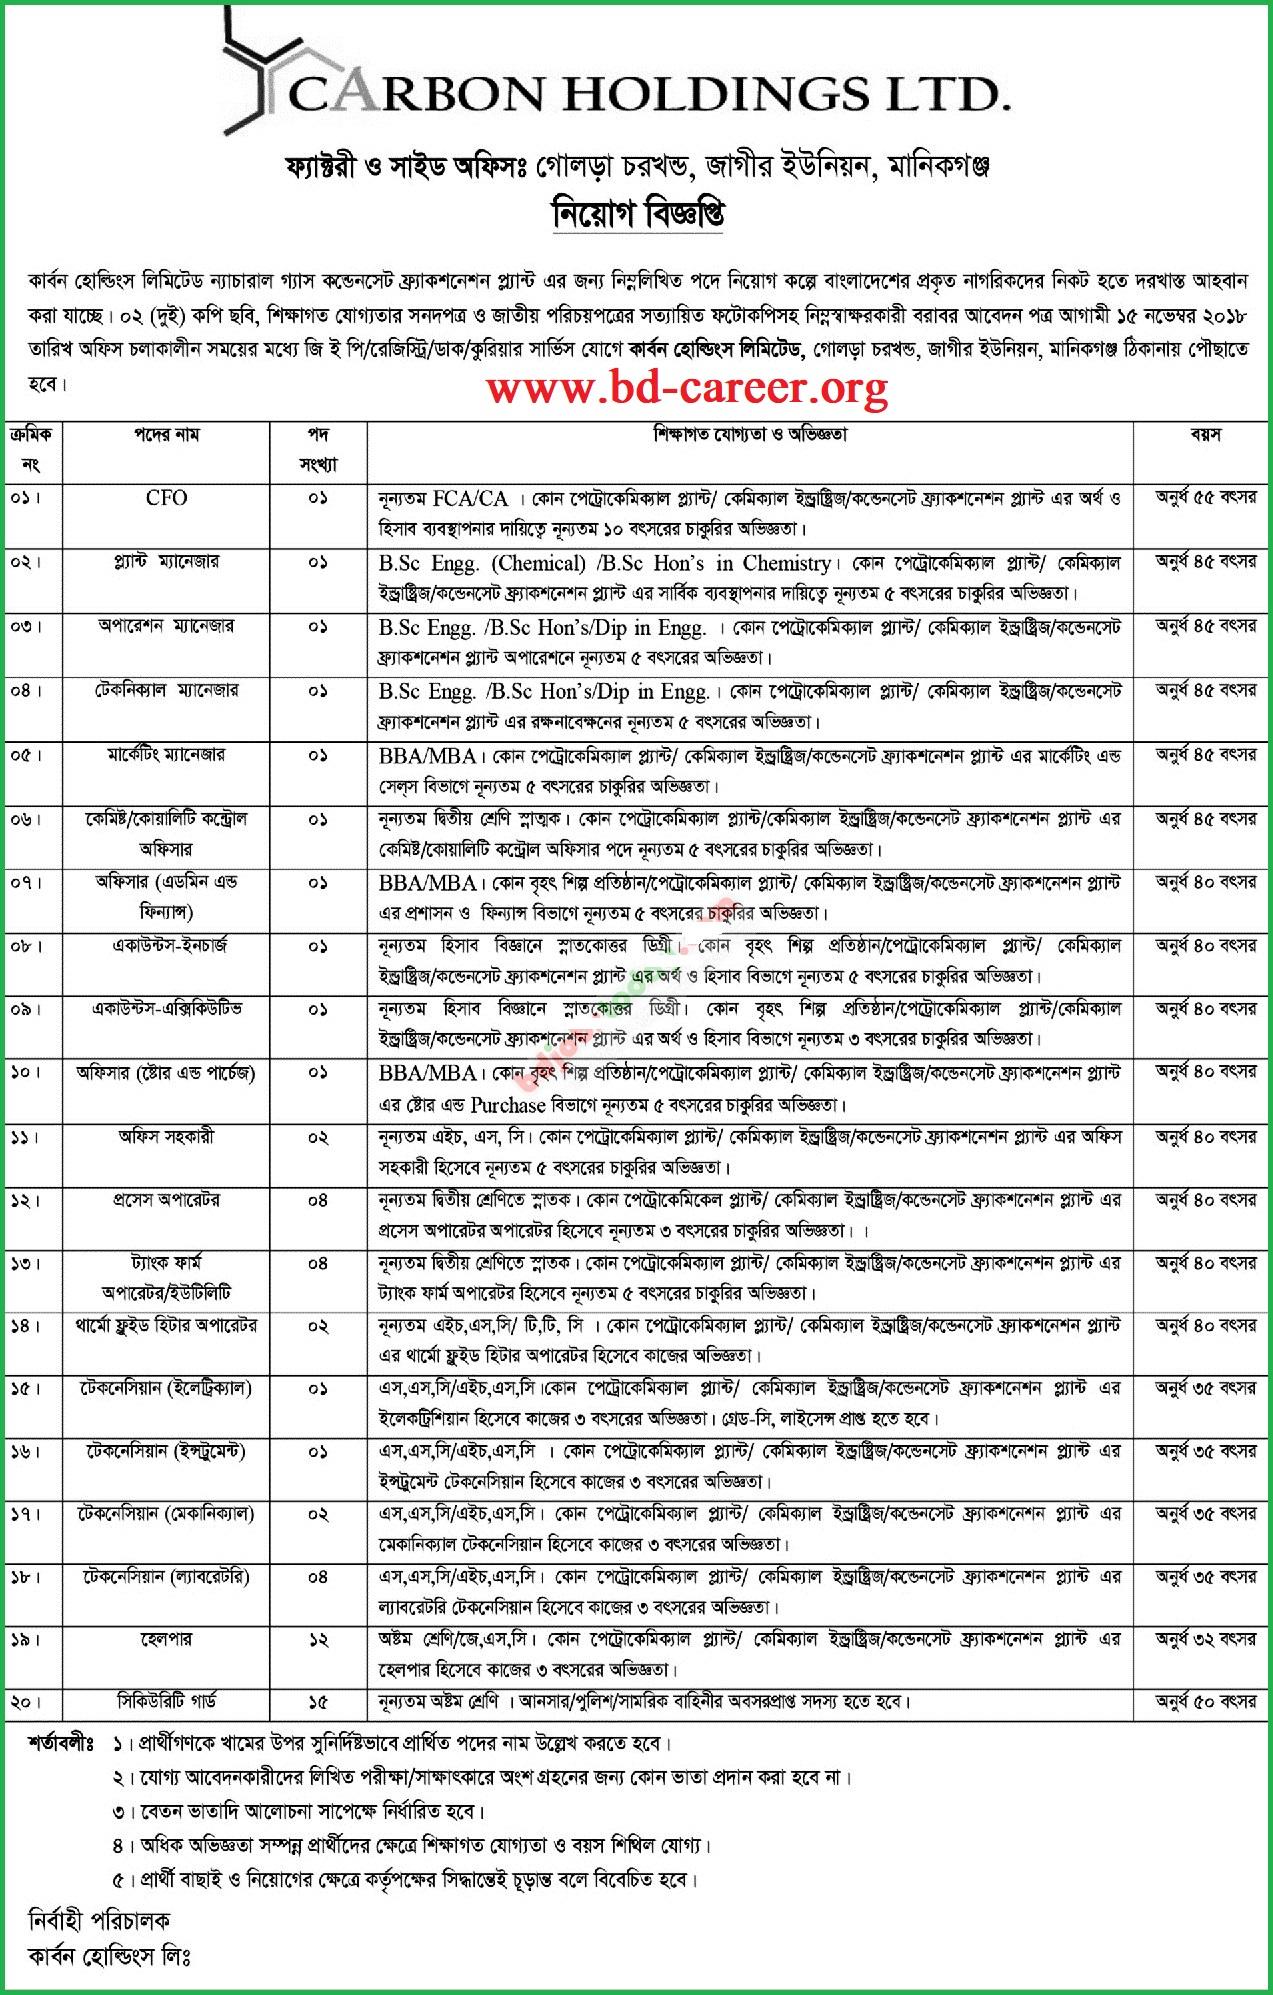 Carbon Holdings Ltd Job Circular